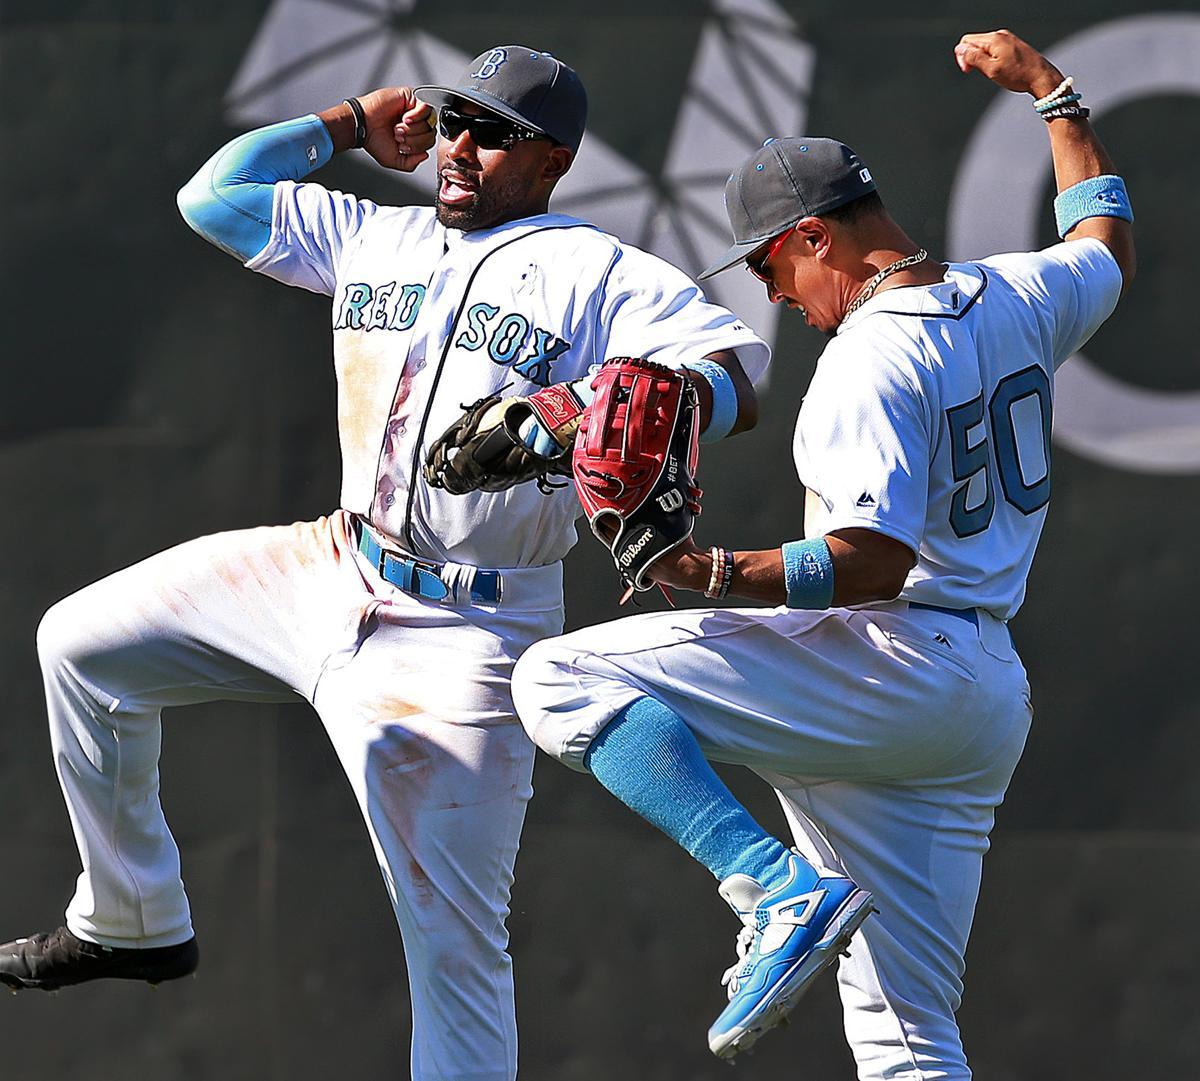 488c69622fc Uni Watch breaks down the 2017 slate of MLB uniforms